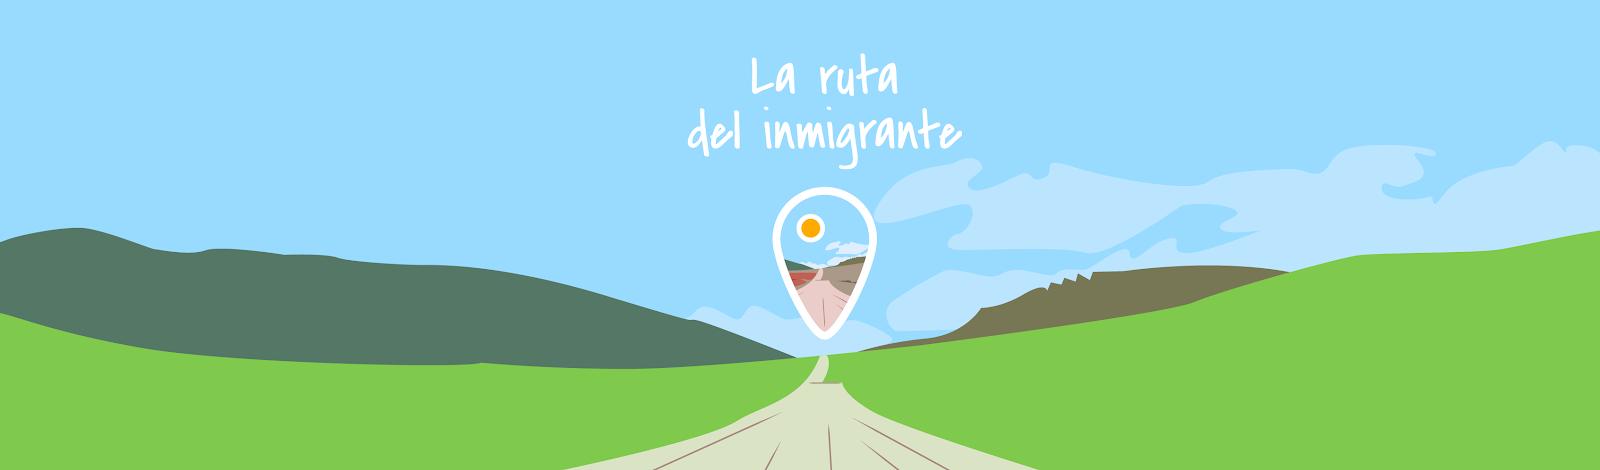 La ruta del inmigrante